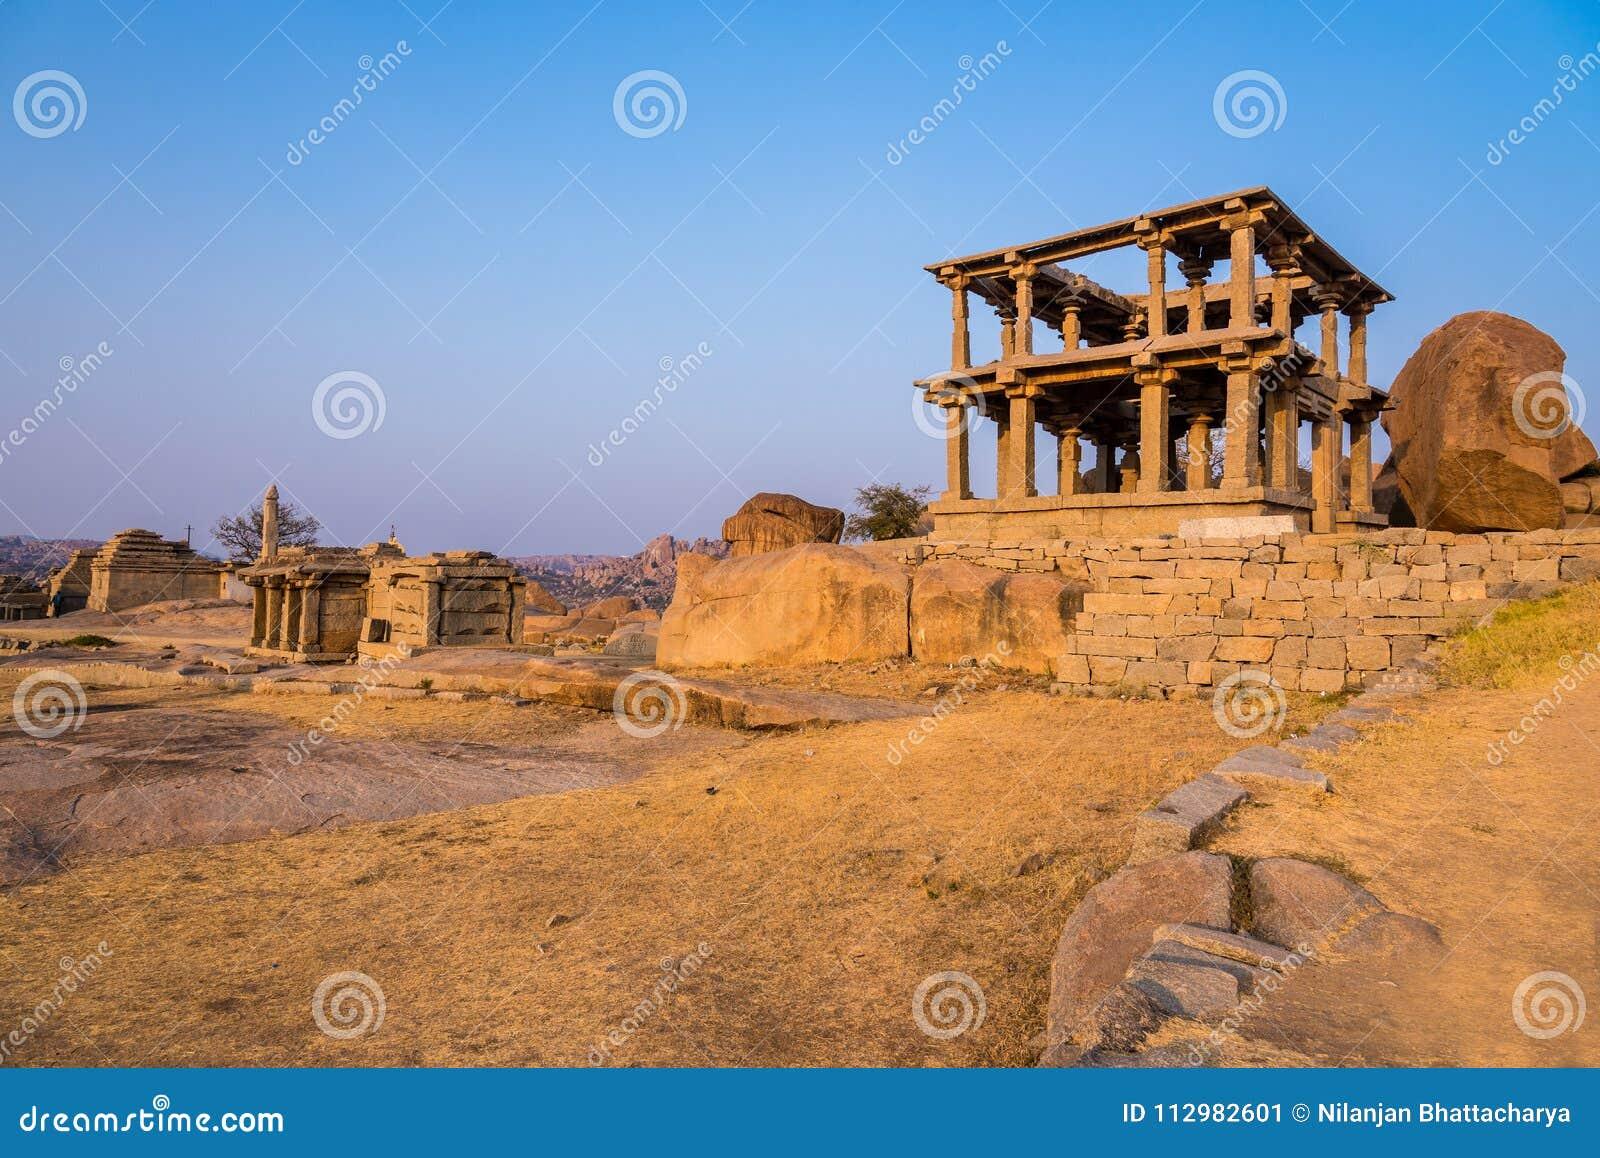 Hemakuta hills ruins at Hampi